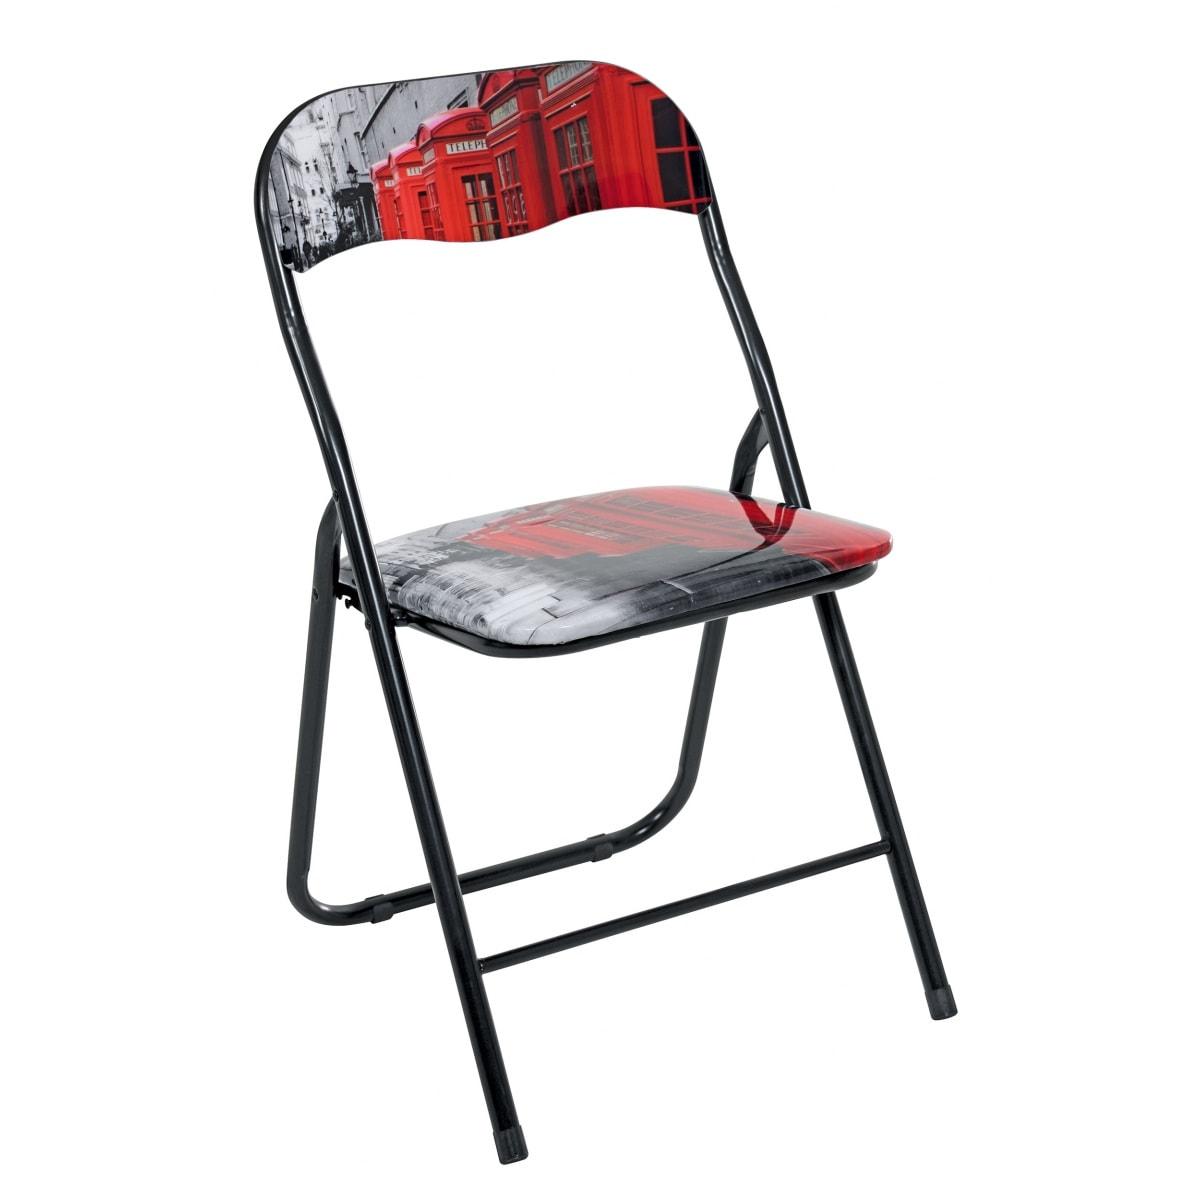 klappstuhl mit motiv st hle esszimmer wohnen m bel. Black Bedroom Furniture Sets. Home Design Ideas